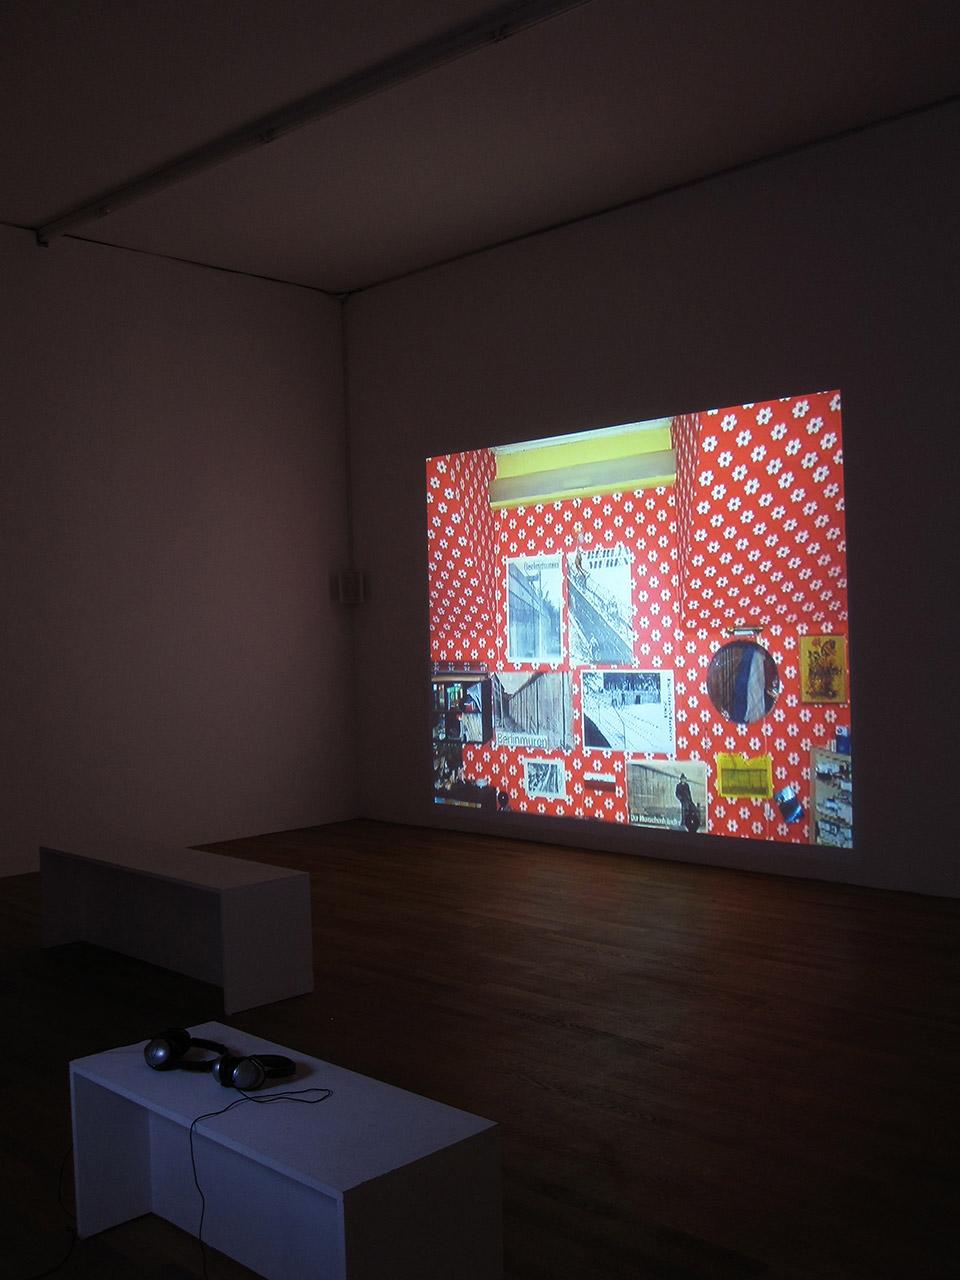 Lars-Laumann-Kunsthalle-Winterthur-2011-3.jpg